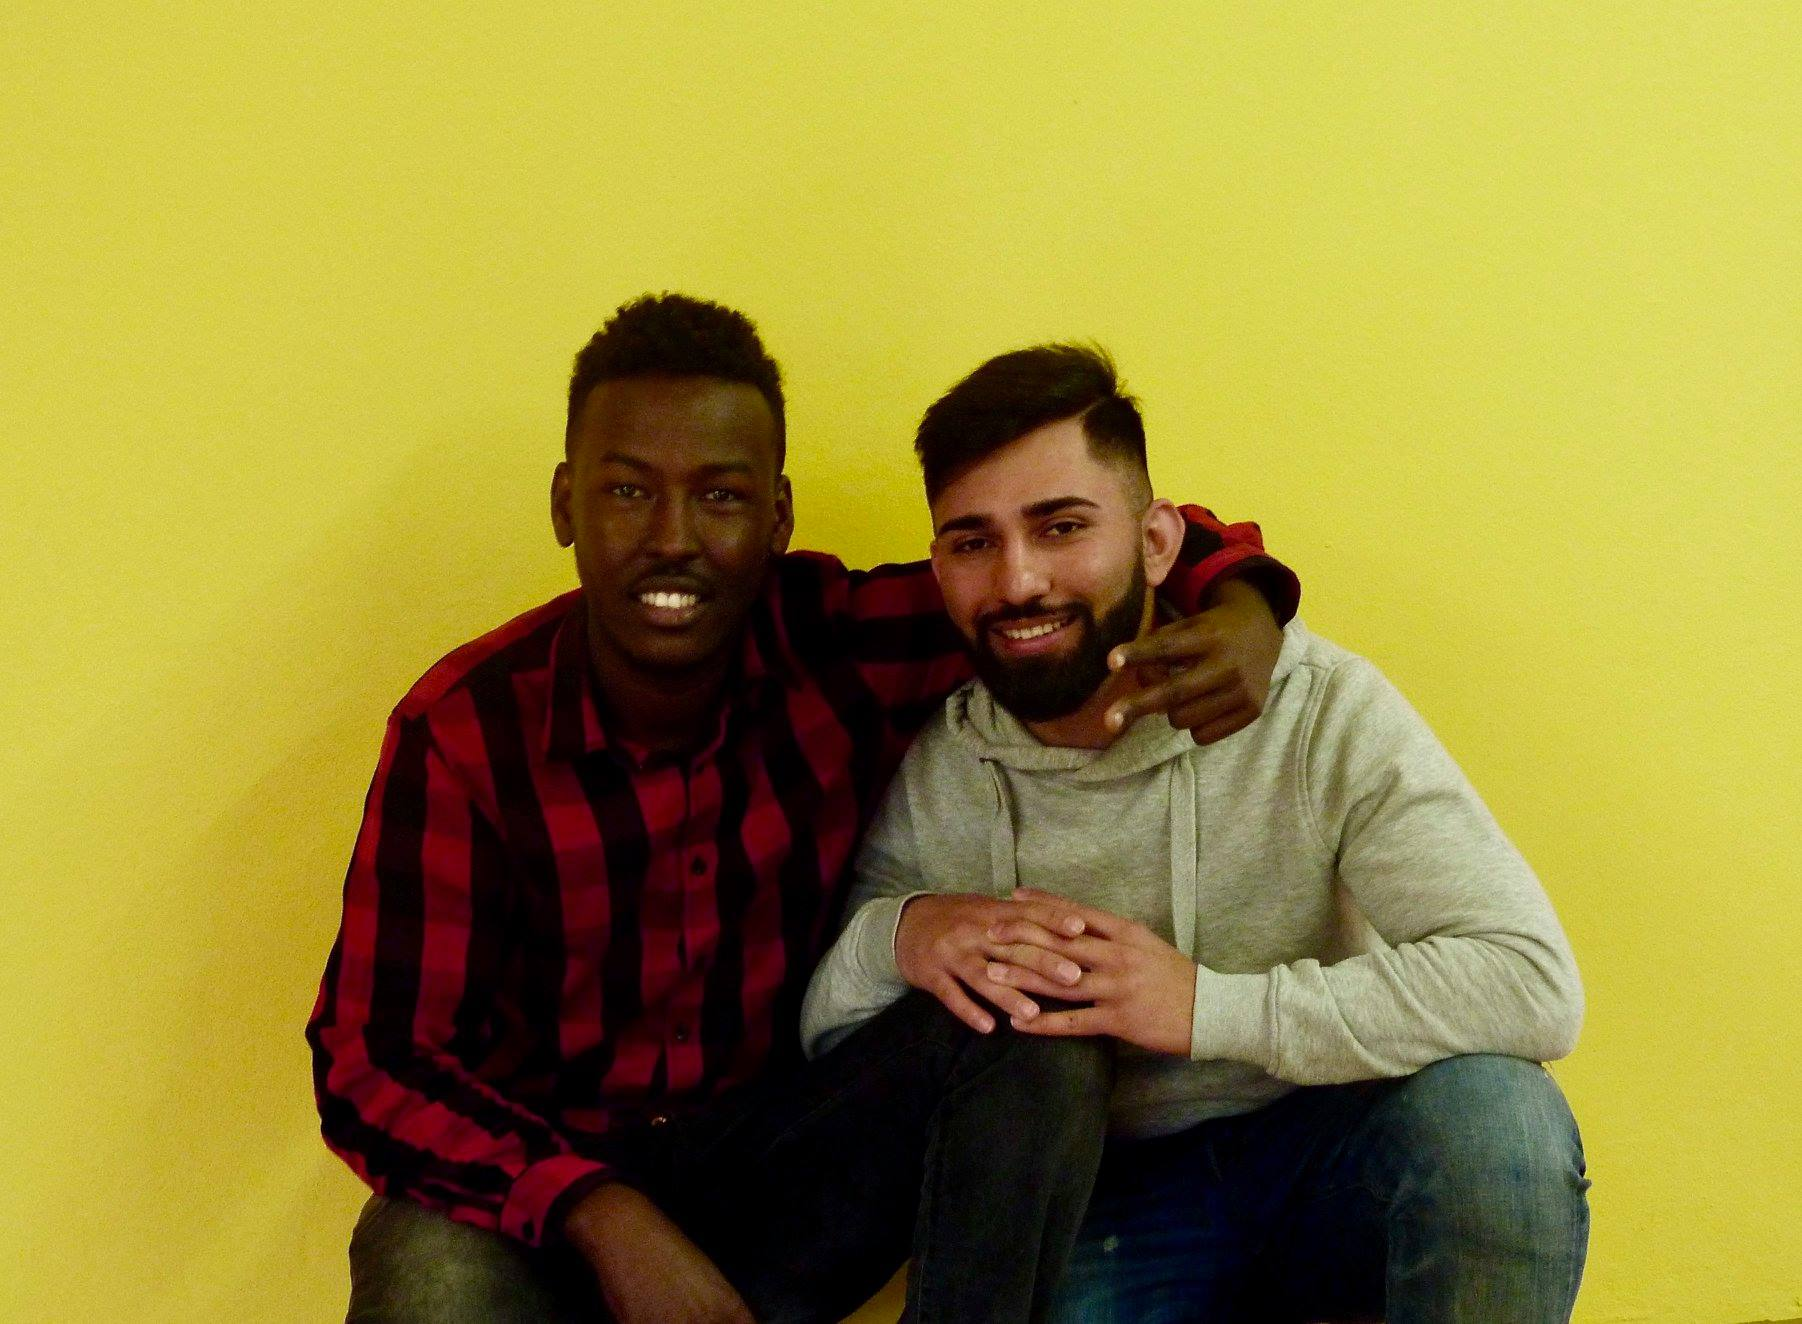 Abdi und Evdo.jpg